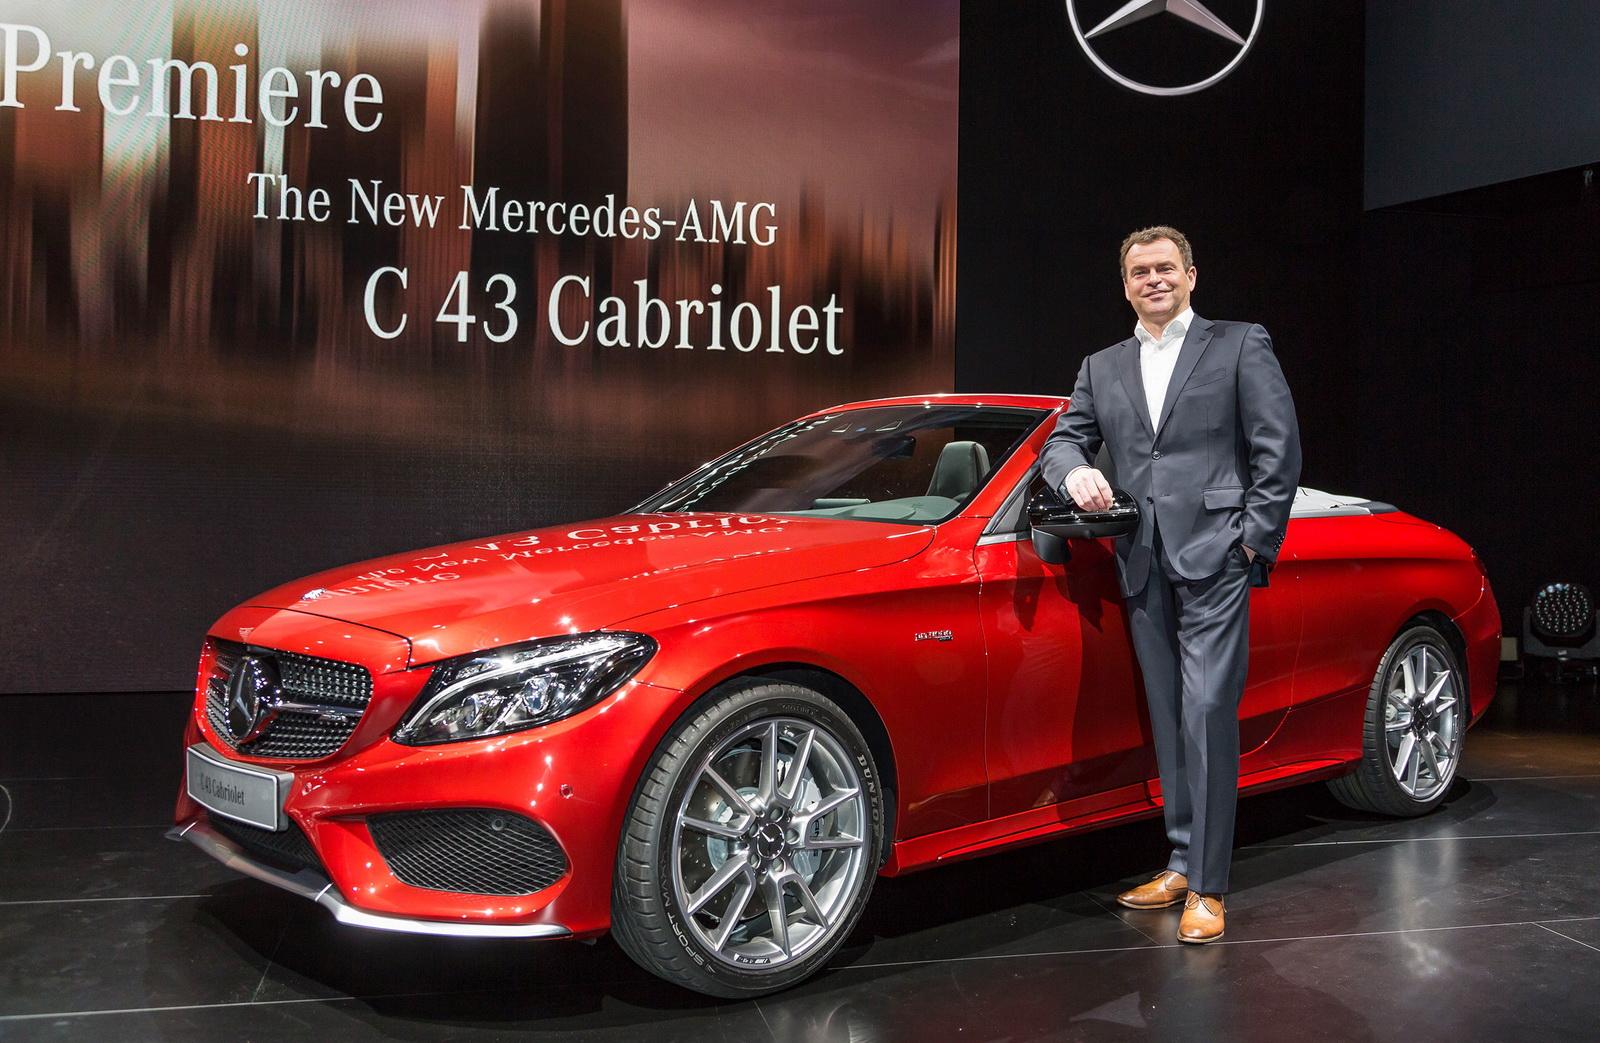 Mercedes-AMG C 43 4Matic Cabriolet 2017